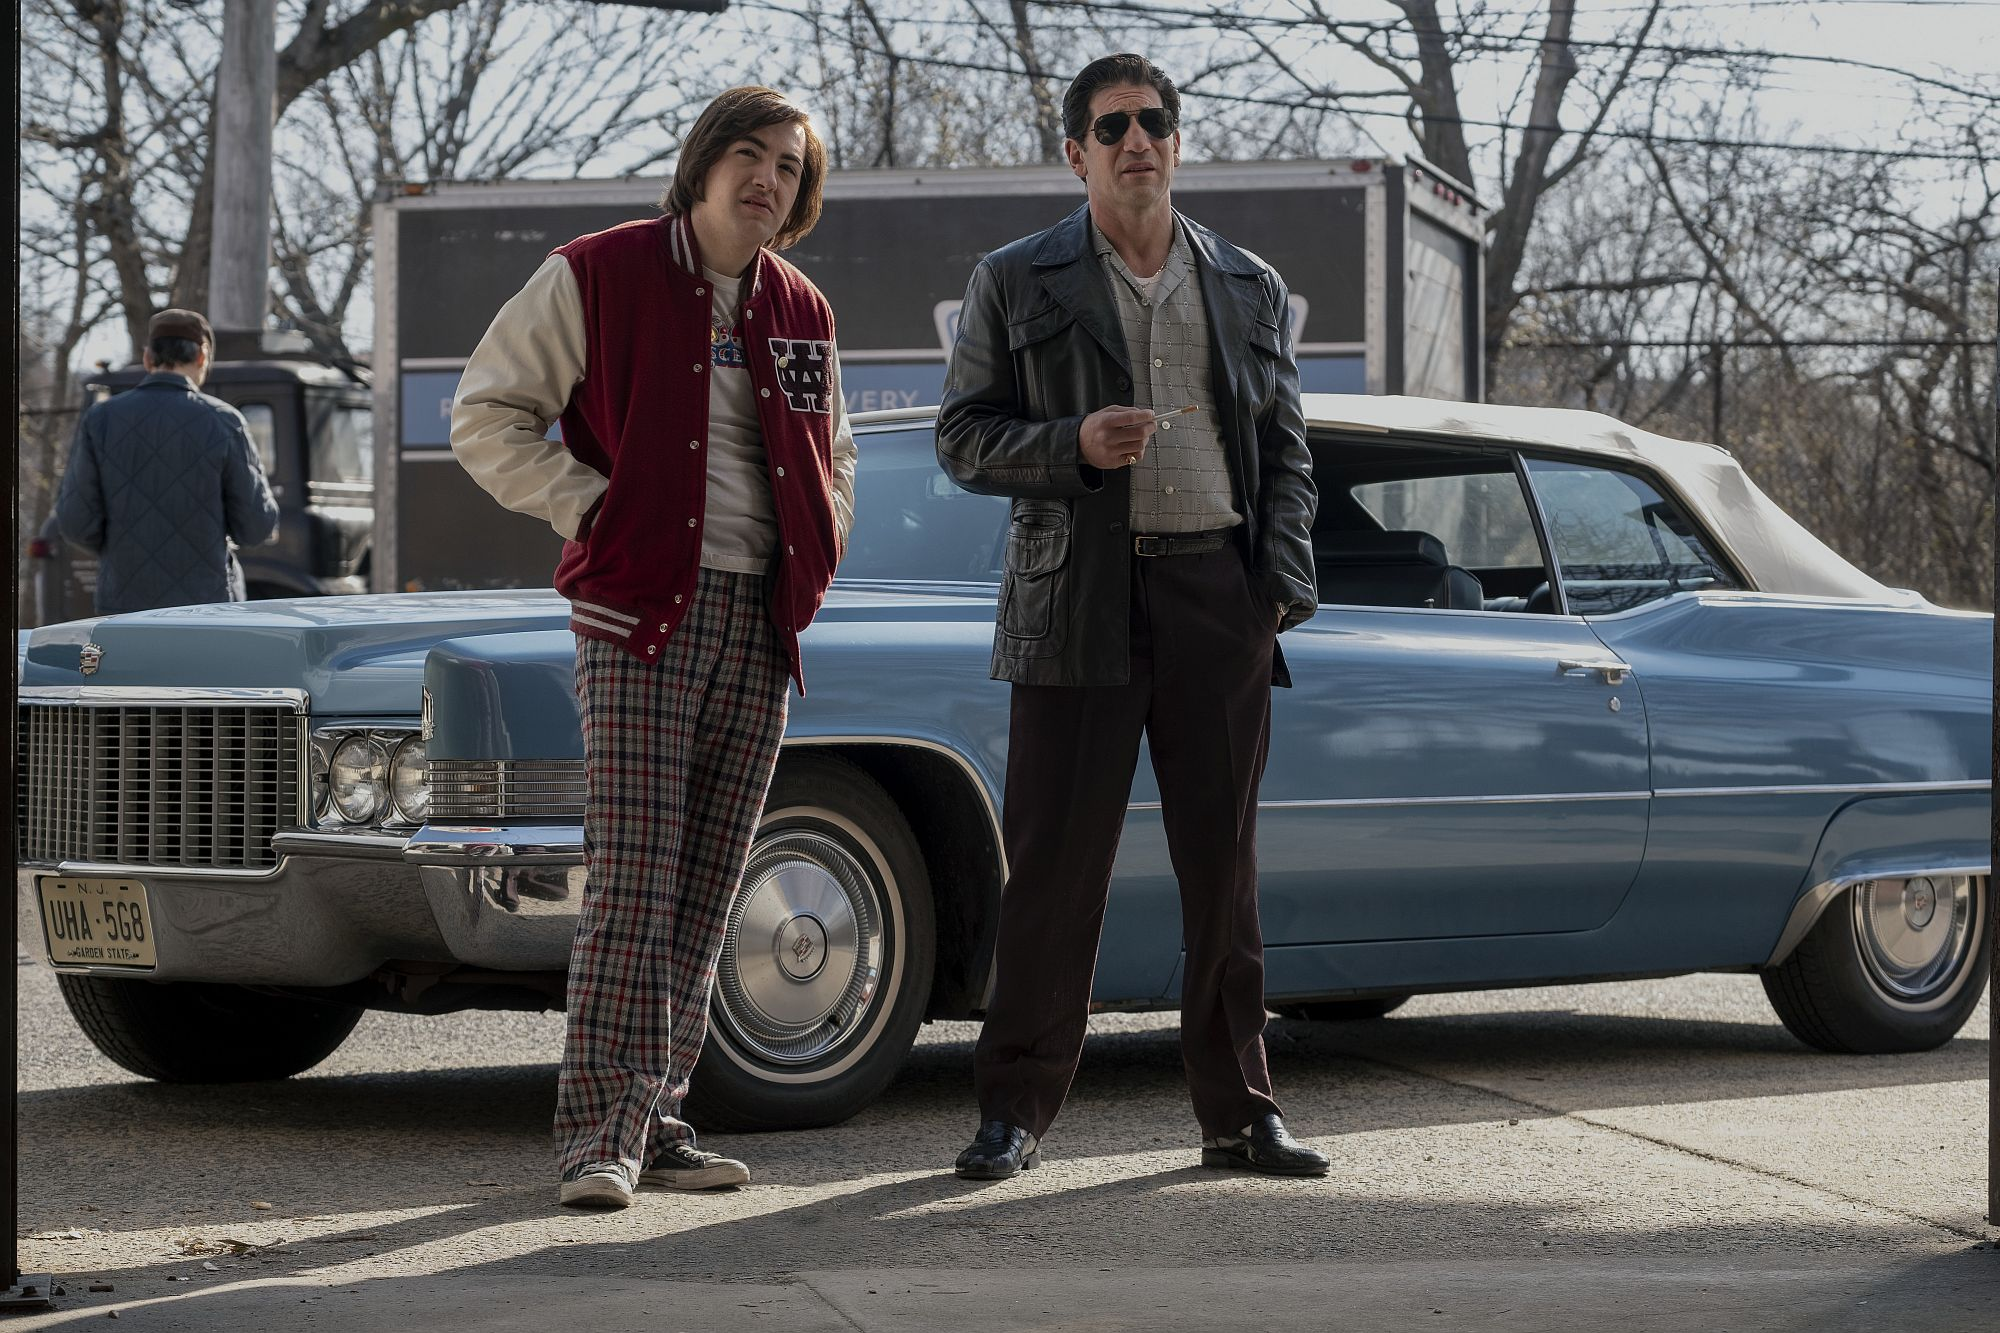 (L-r) MICHAEL GANDOLFINI als Teenager Tony Soprano und JON BERNTHAL as Johnny Soprano.